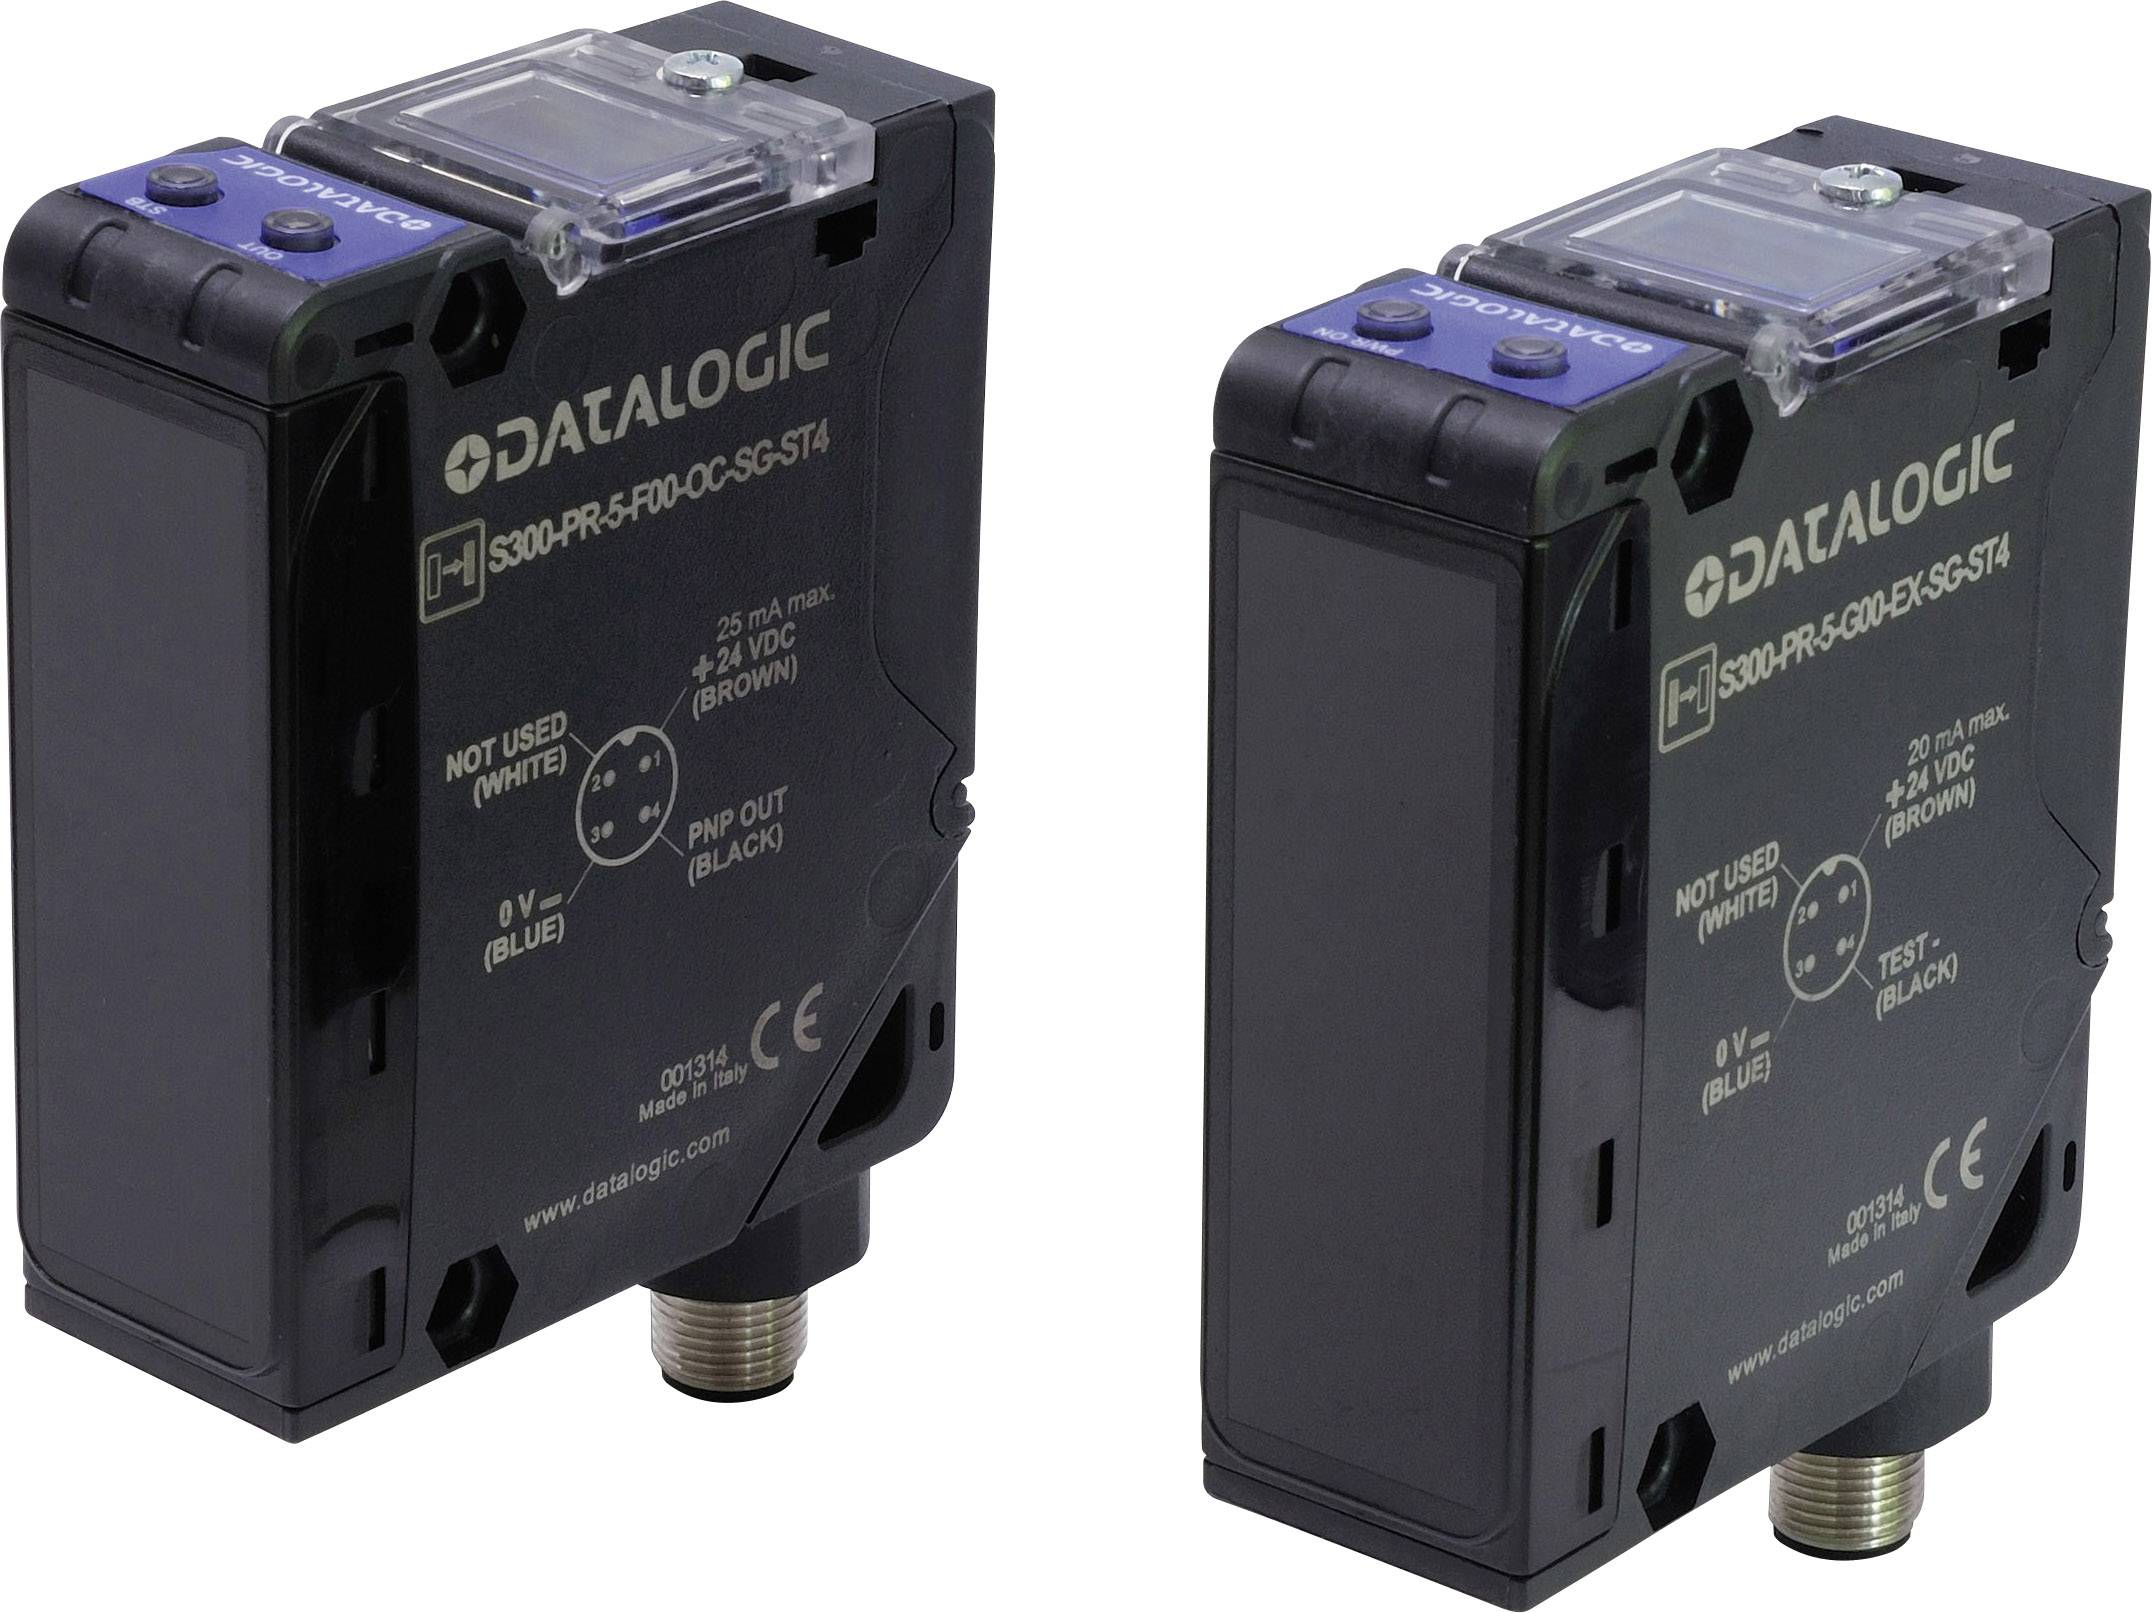 Reflexná svetelná závora DataLogic S300-PR-1-M01-RX 951451180, max. dosah 2.5 m